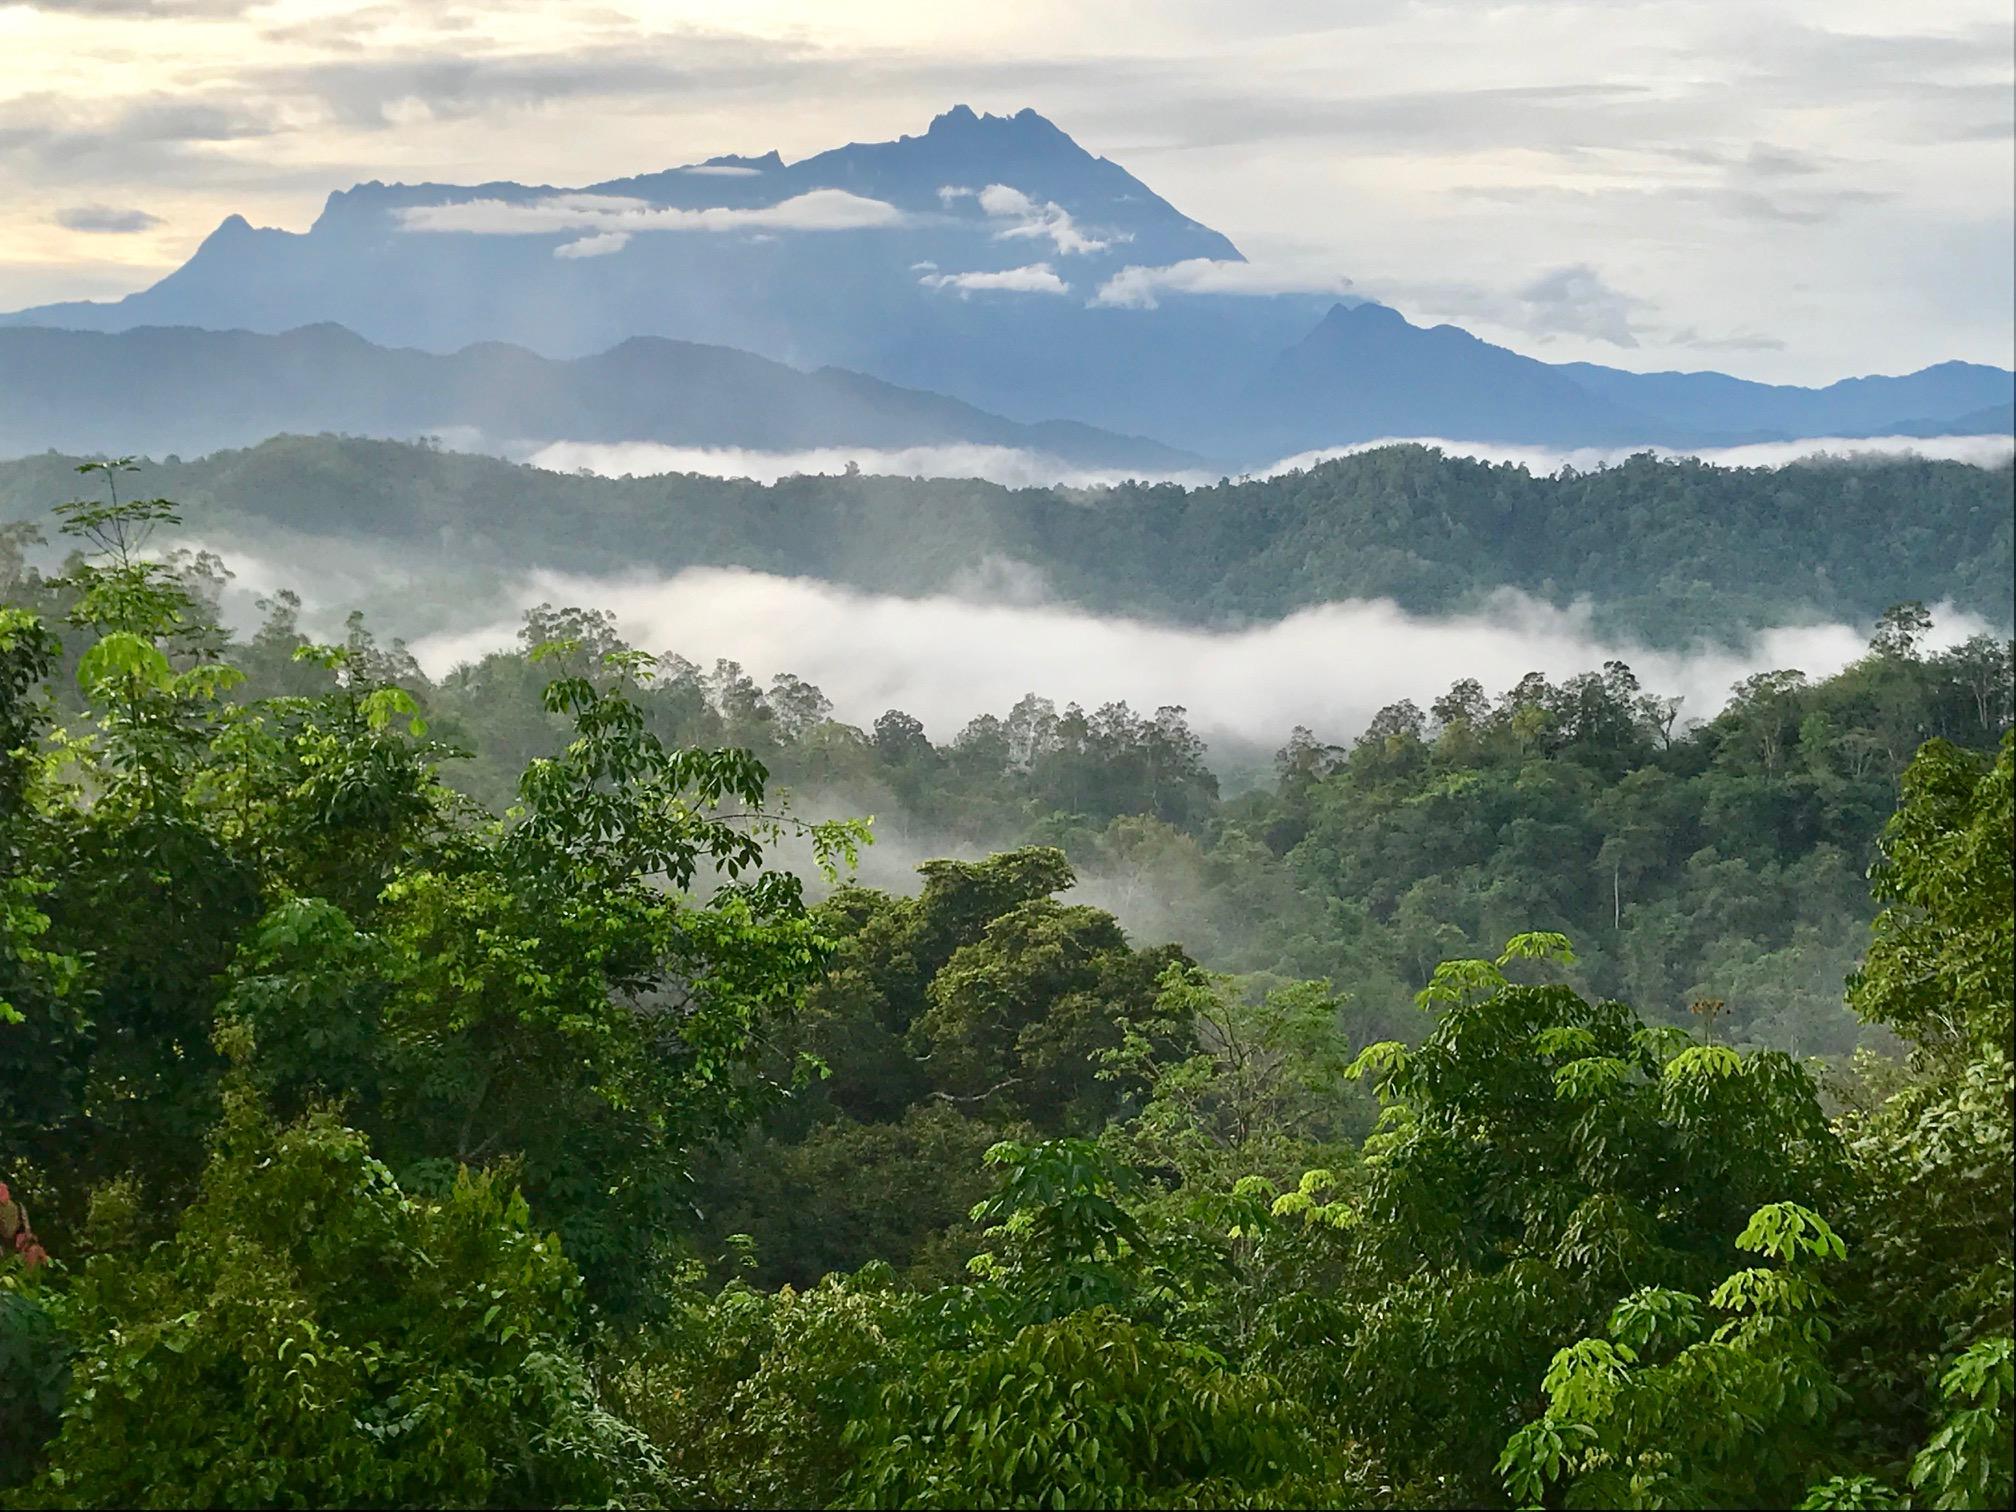 ilha de bornéu lar dos orangotangos